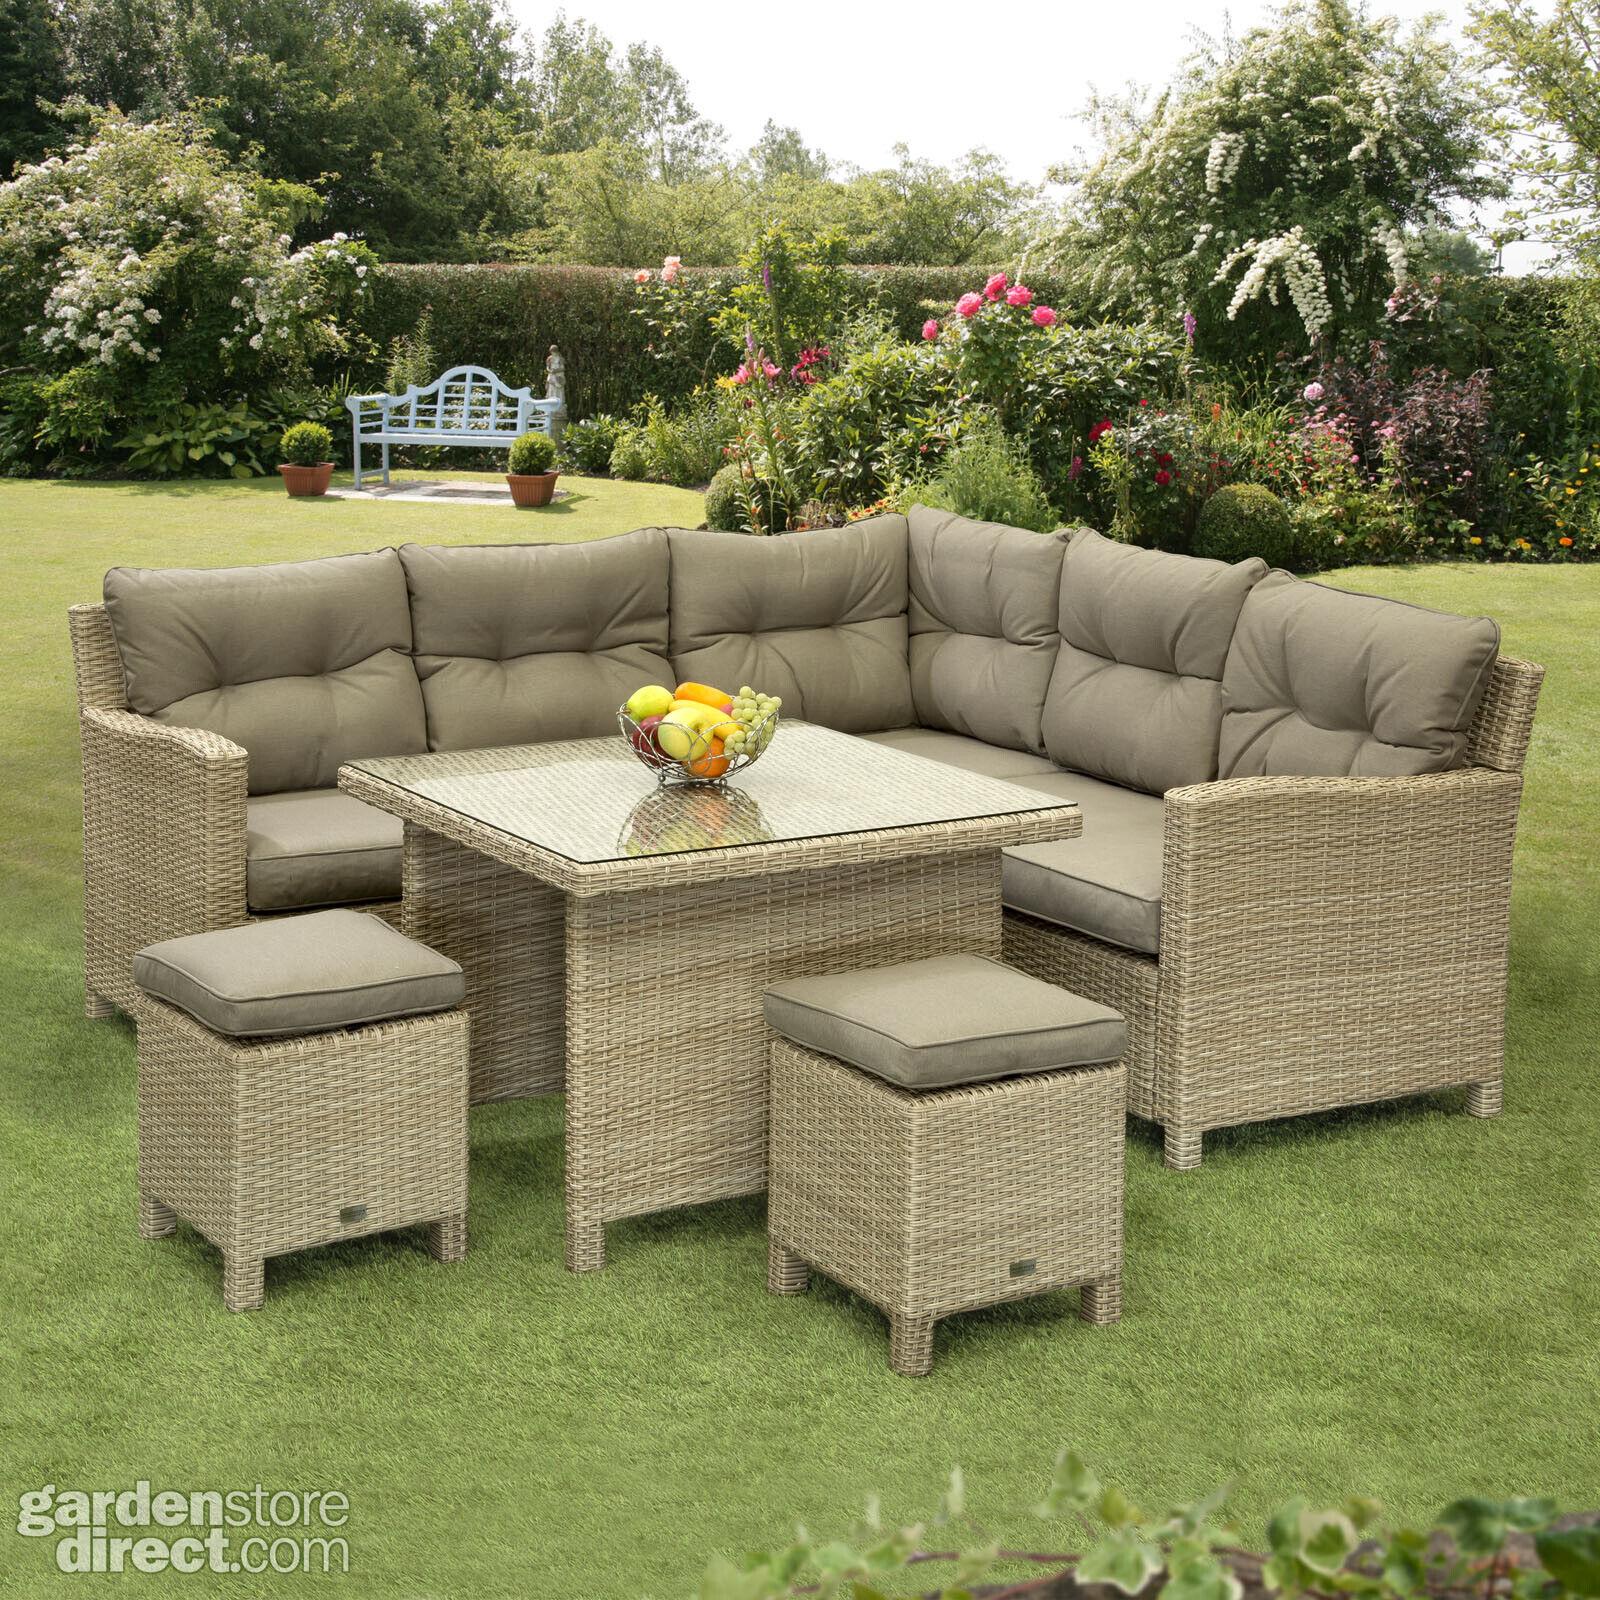 Garden Furniture - Sarasota Rattan Garden Dining Set 2,4,6,7 Seat Wicker Sofa Set Sun Lounger